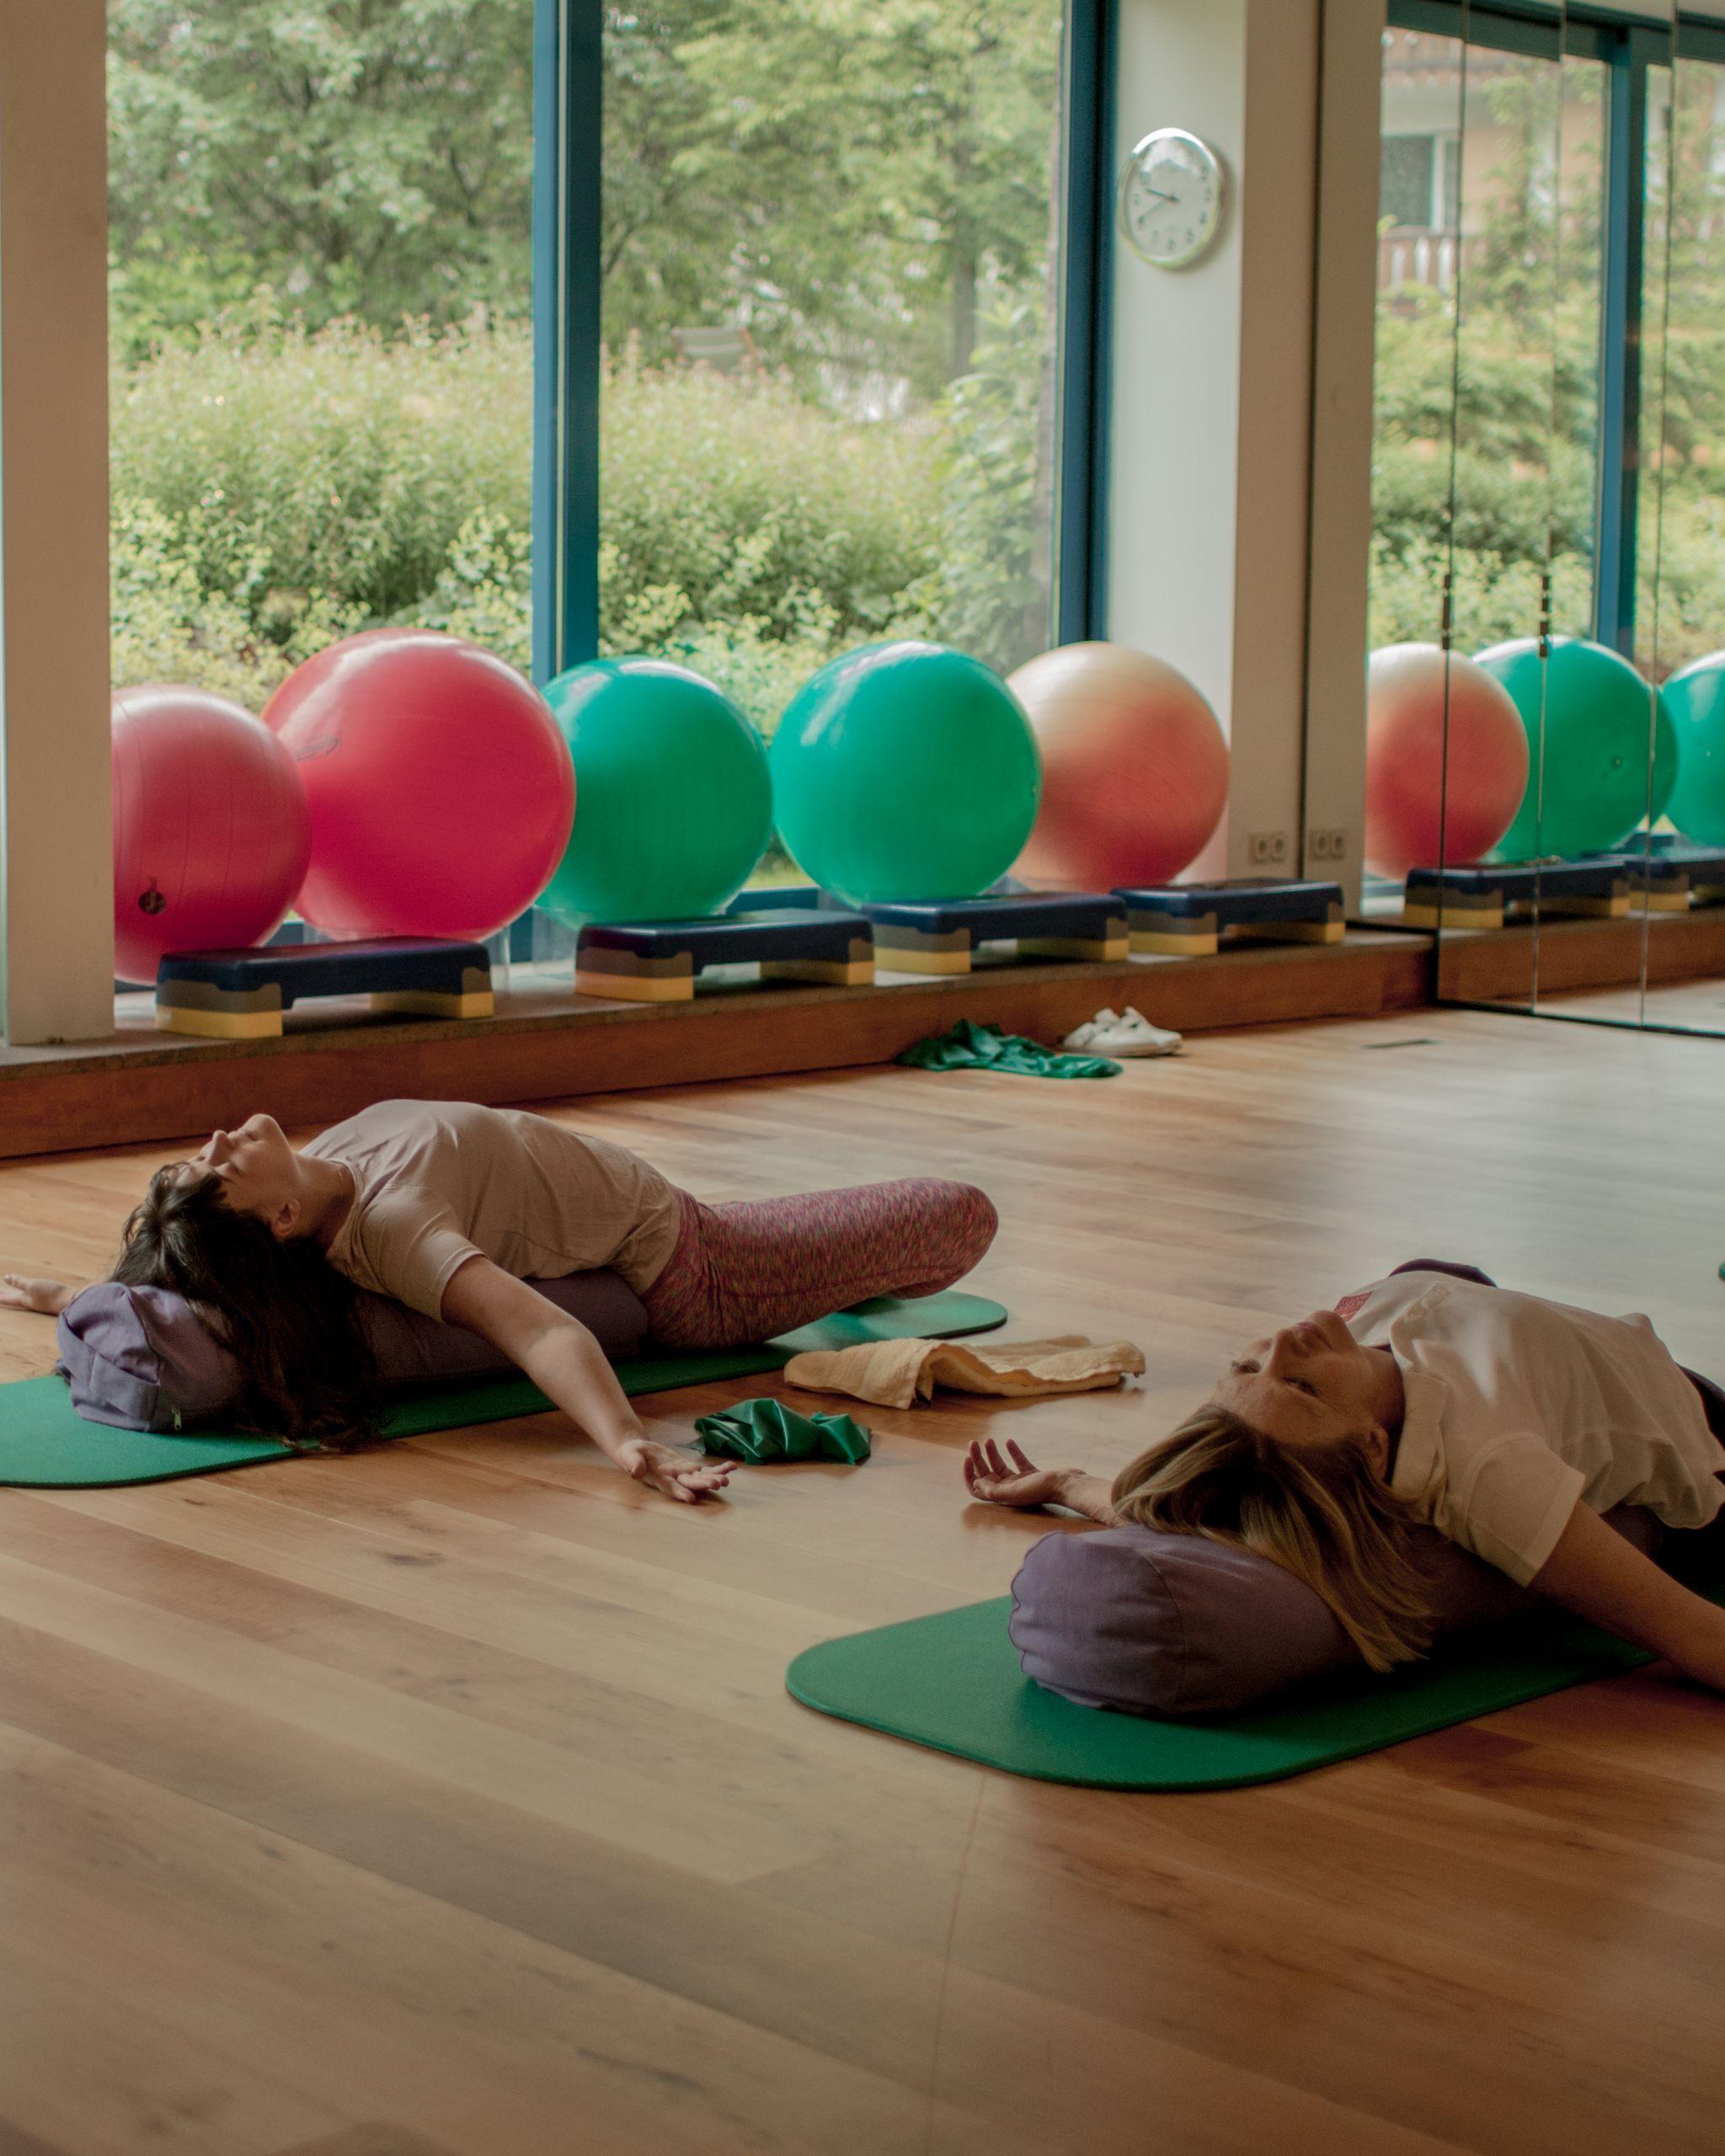 Adler Dolomites Hotel Ortisei Italy Hotel Review Yoga Retreat relaxation